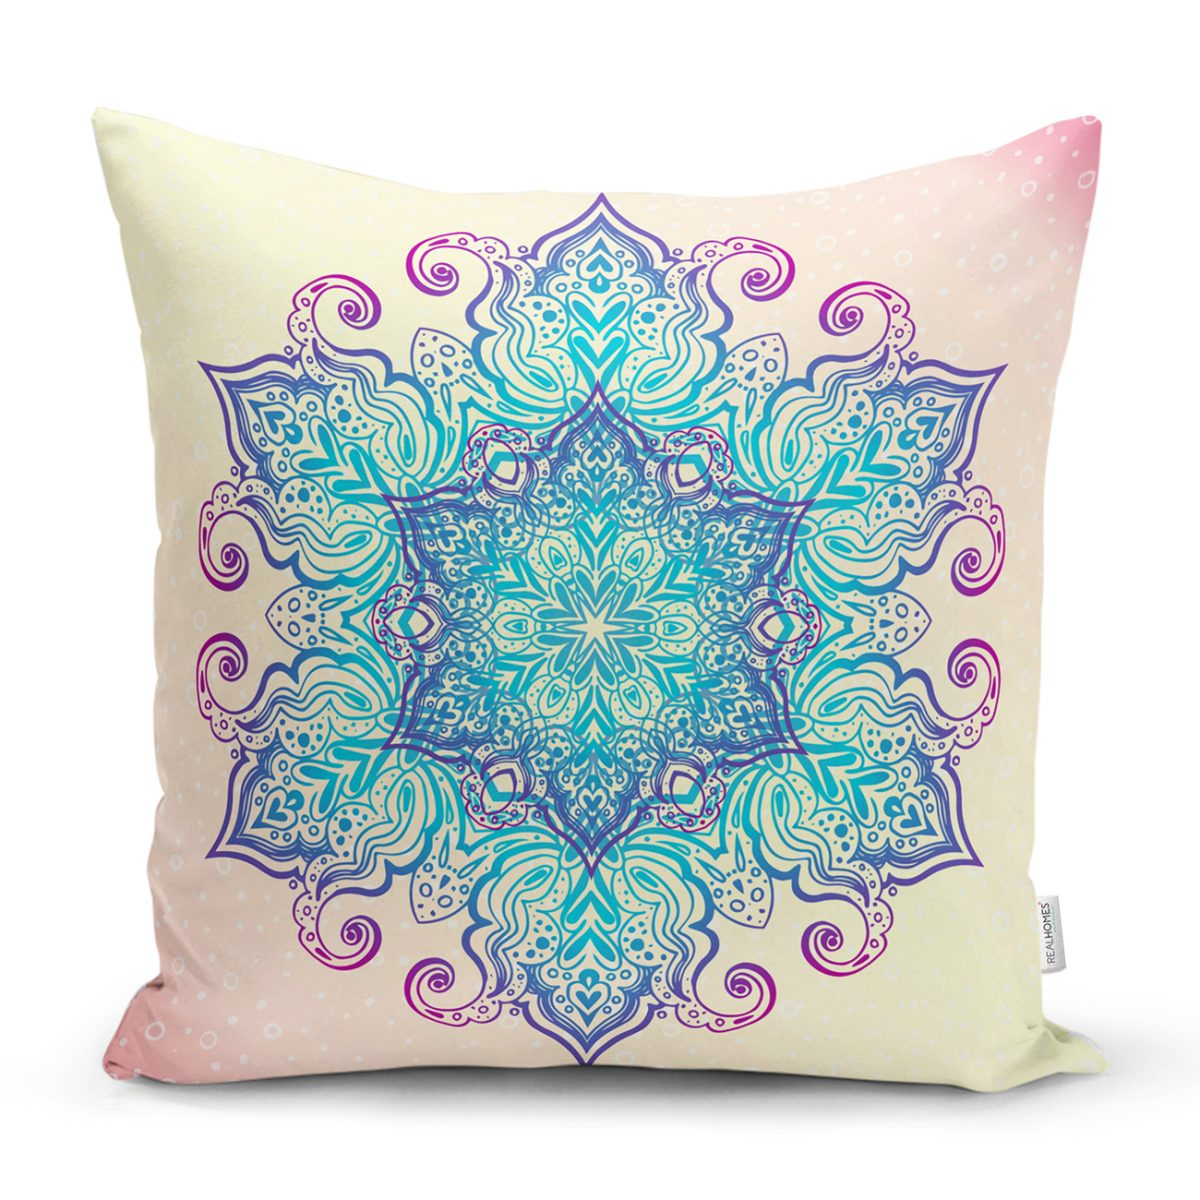 Pembe Zeminde Mavi Mandala Çizimli Modern Yastık Kılıfı Realhomes